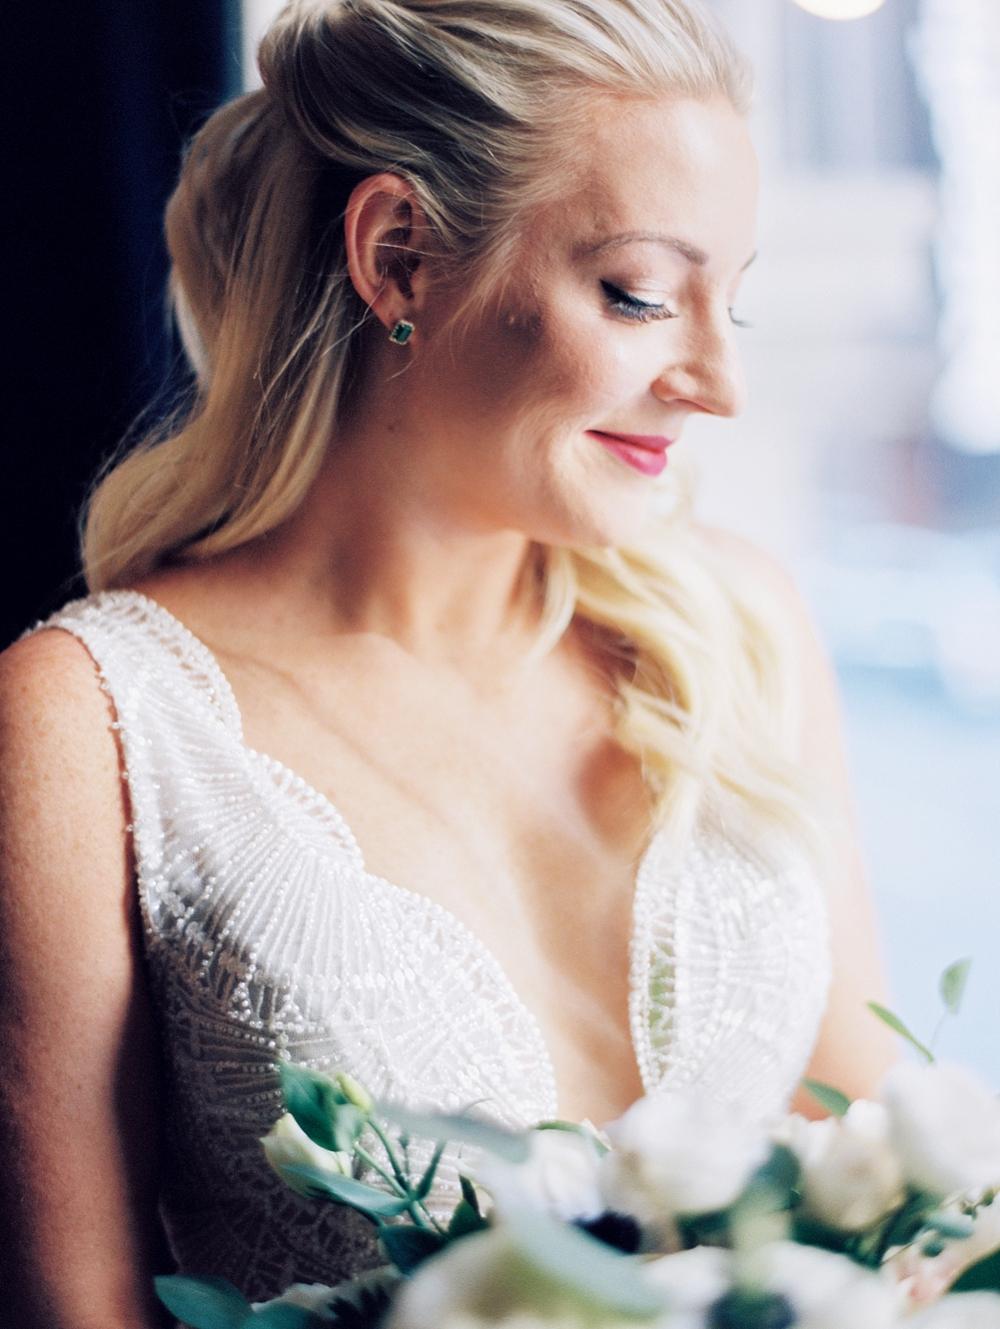 kristin-la-voie-photography-chicago-Wedding-Photographer-kimpton-gray-hotel-2